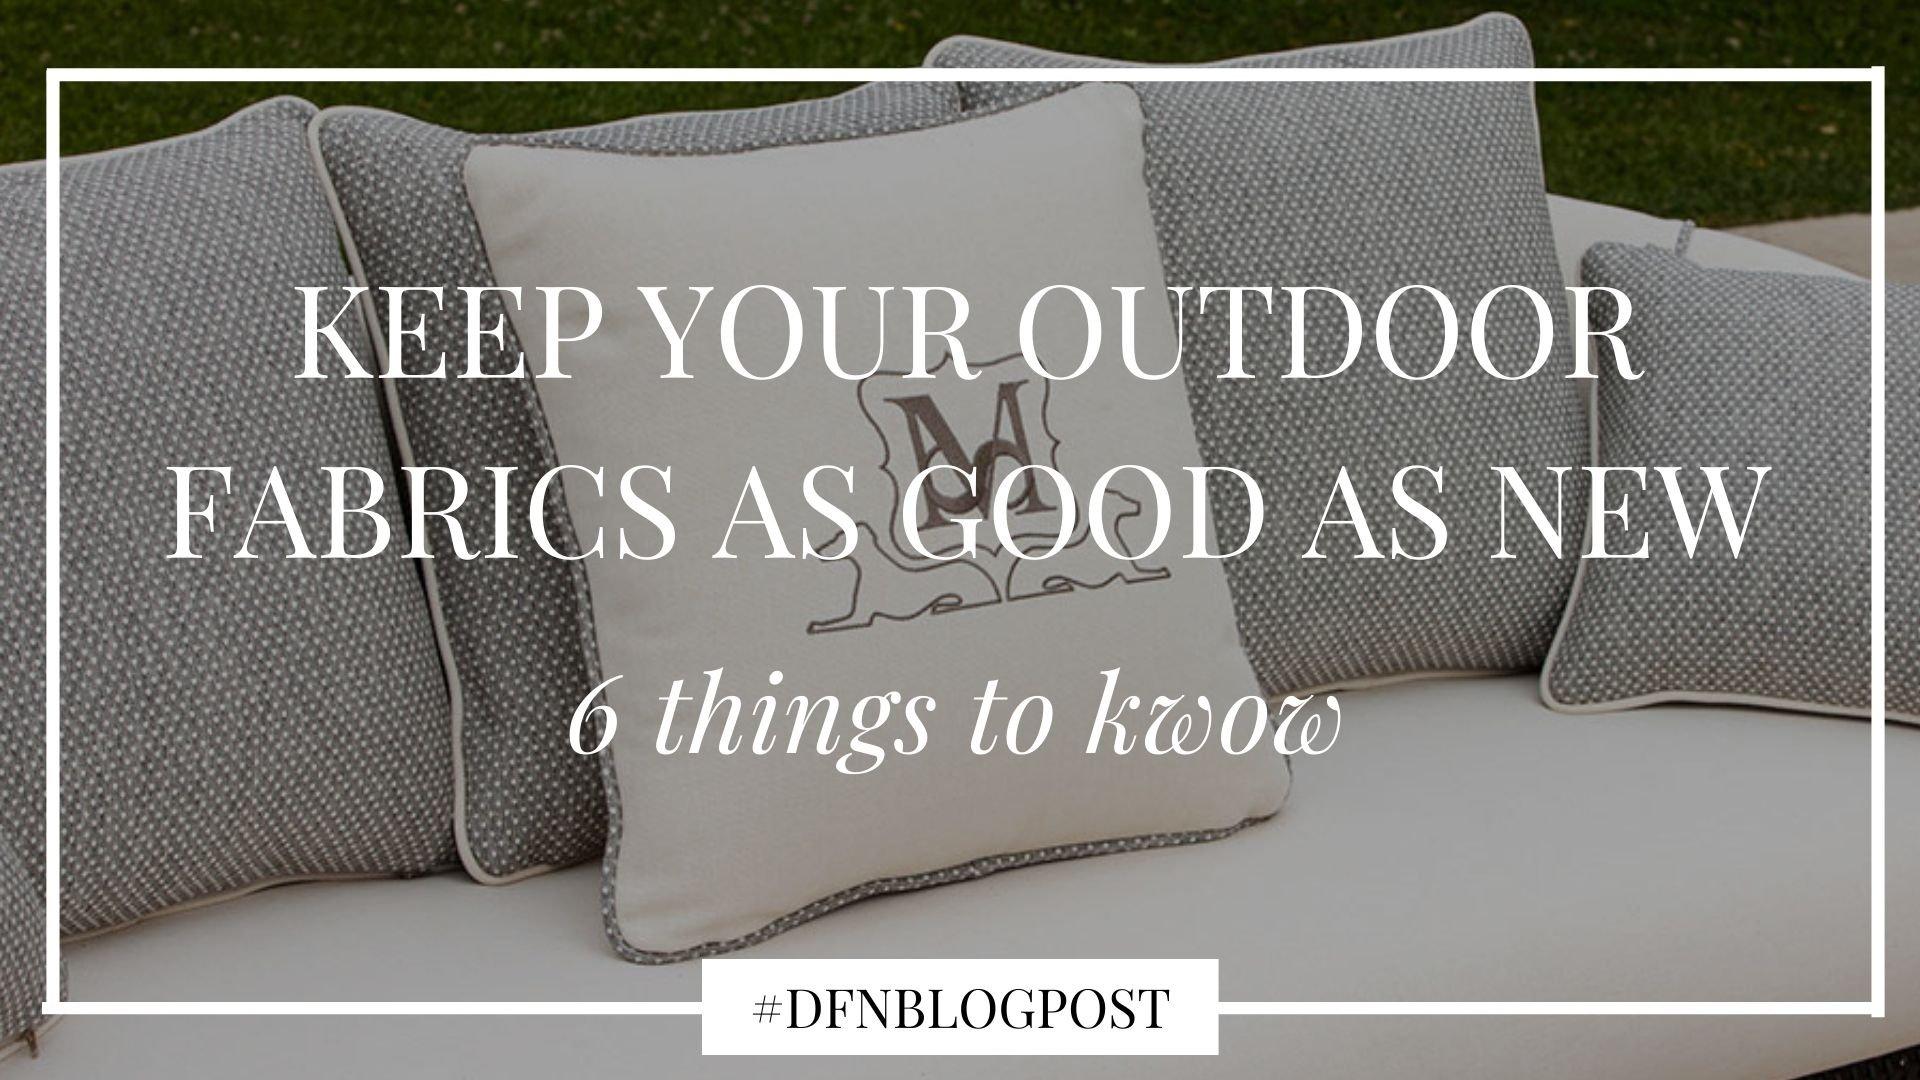 dfn-keep-outdoor-fabrics-new-blog-cover